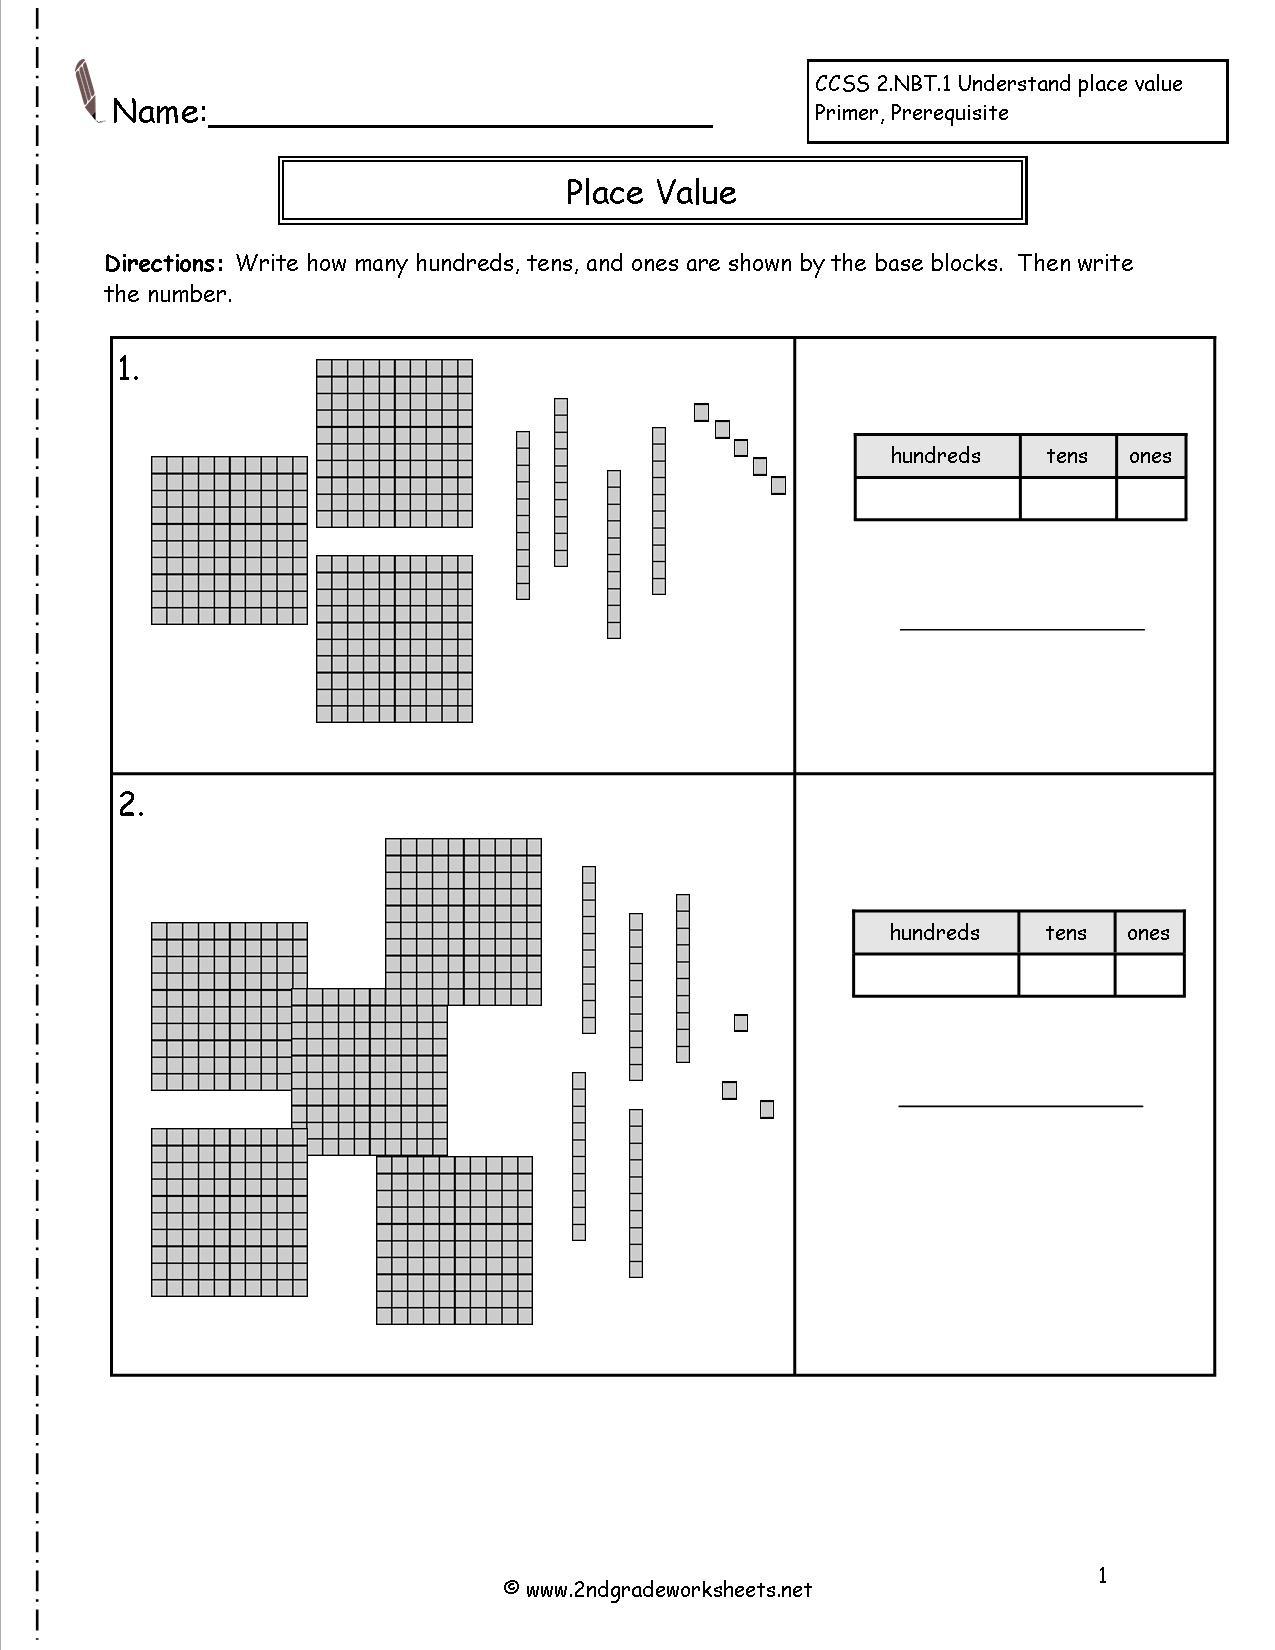 Second Grade Place Value Worksheets - Free Printable Base Ten Block Worksheets